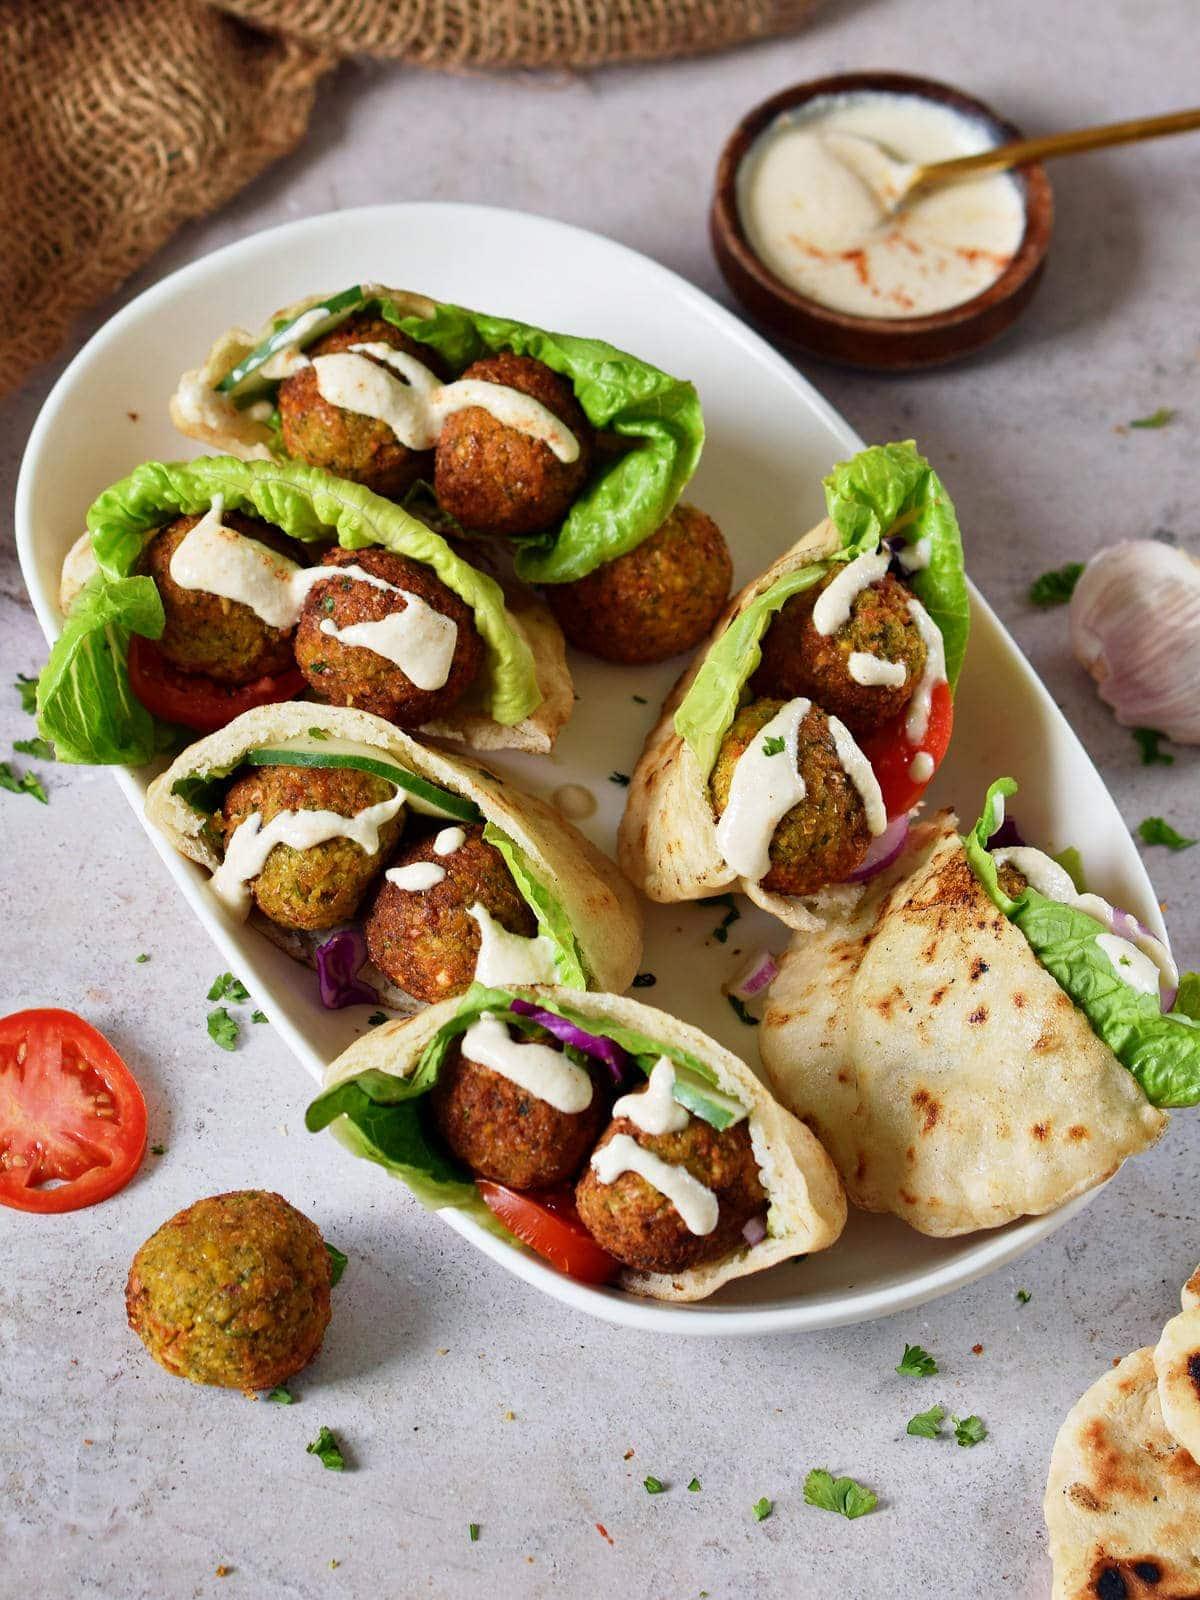 gluten-free air fryer falafel in pita pockets with veggies